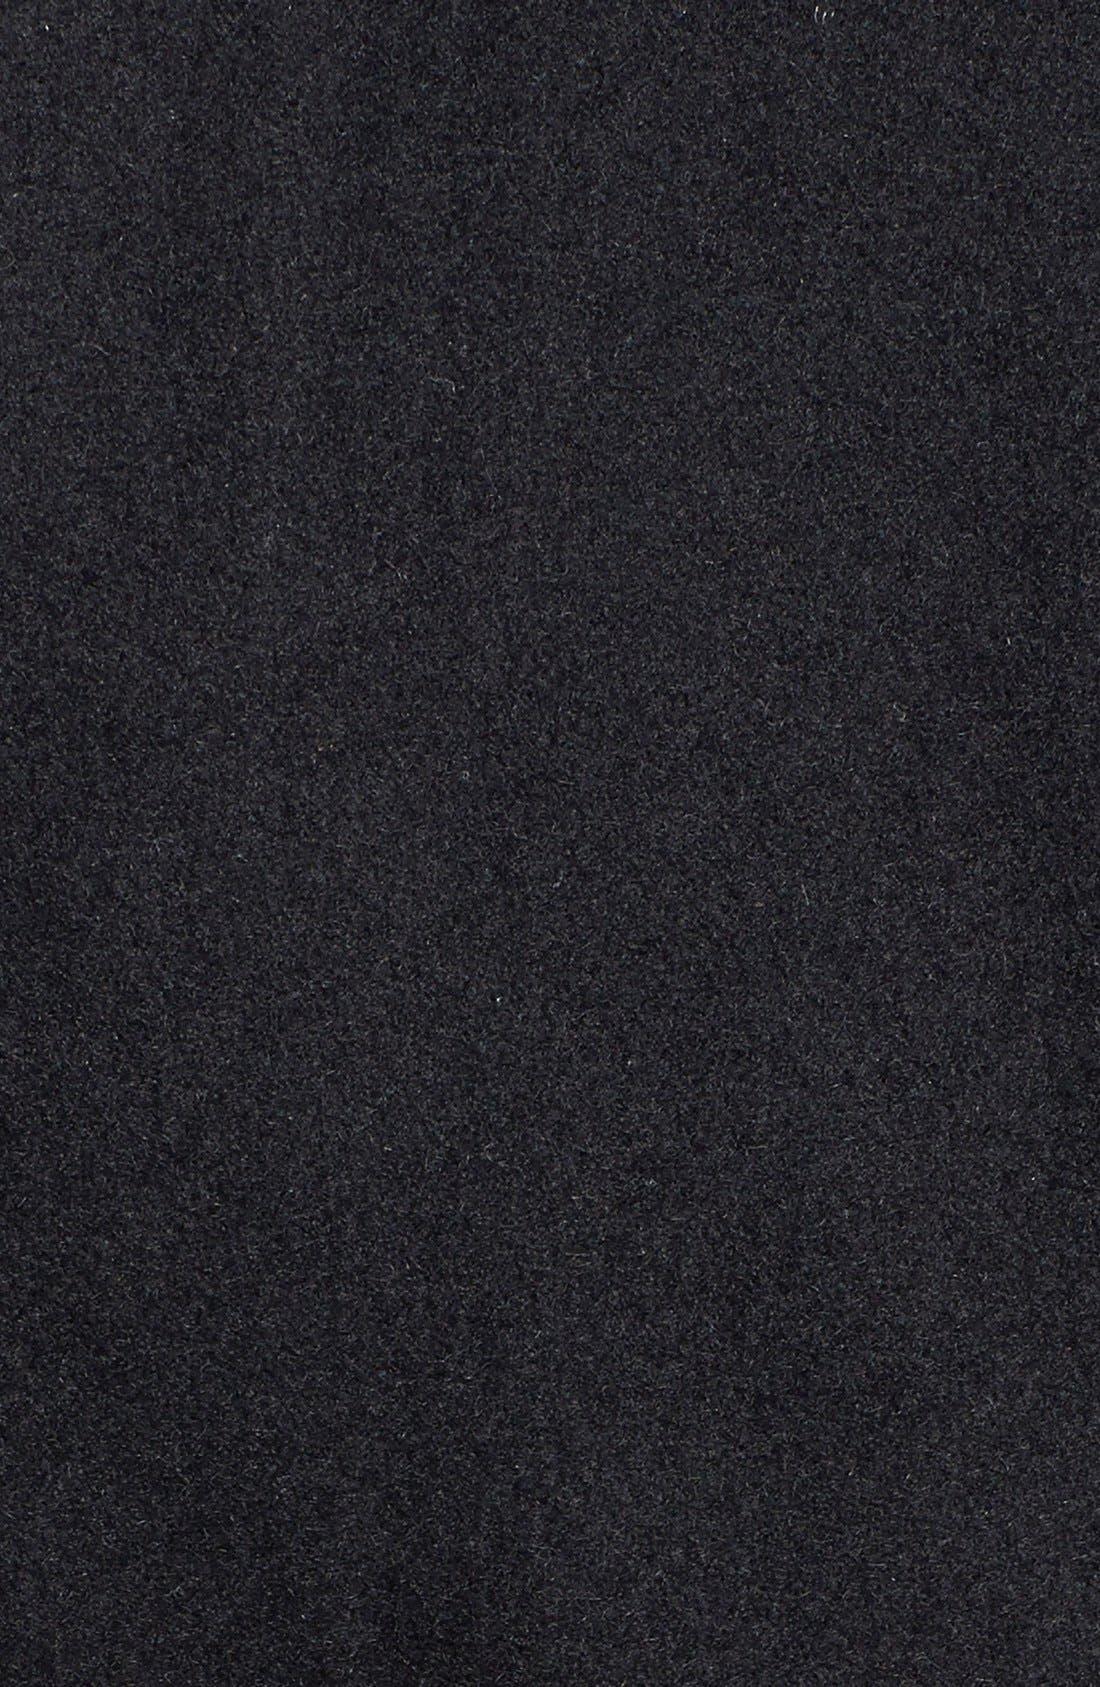 Alternate Image 3  - MICHAEL Michael Kors Belted Hooded Wool Blend Asymmetrical Coat (Online Only)